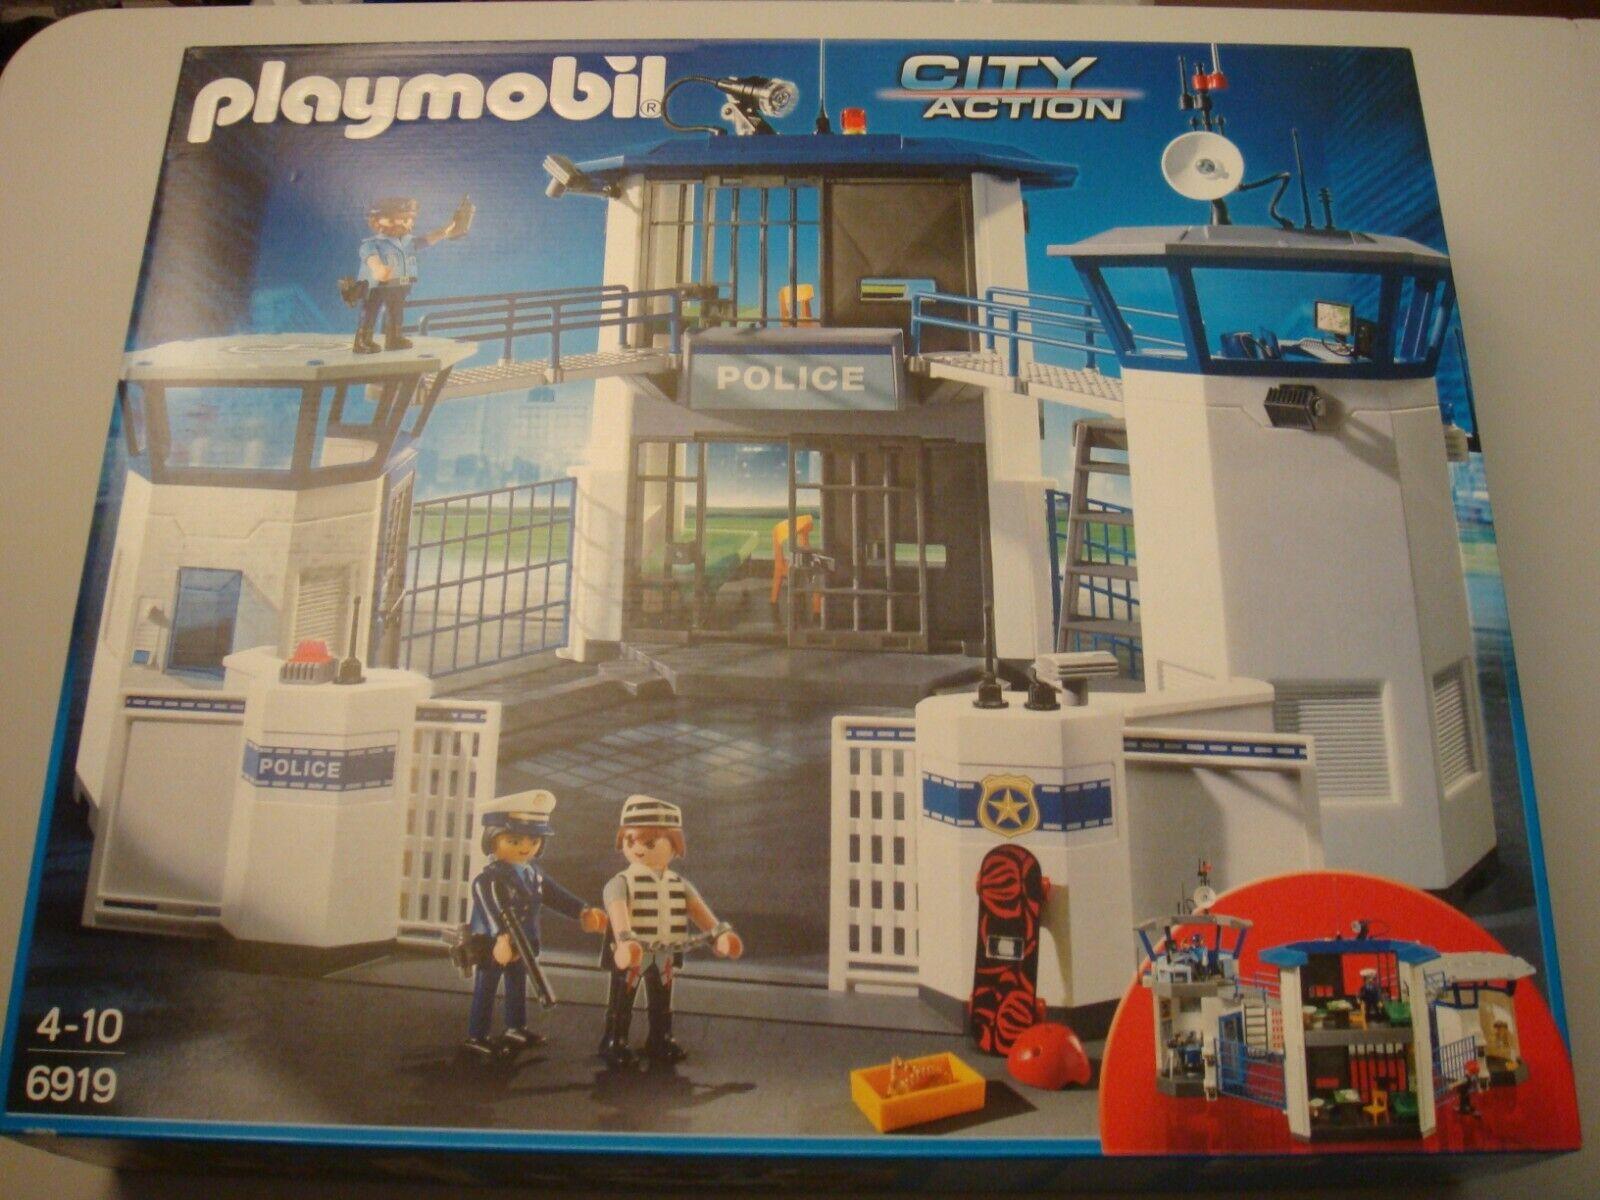 Playmobil playset City Action Police 6919 Neuf Boîte